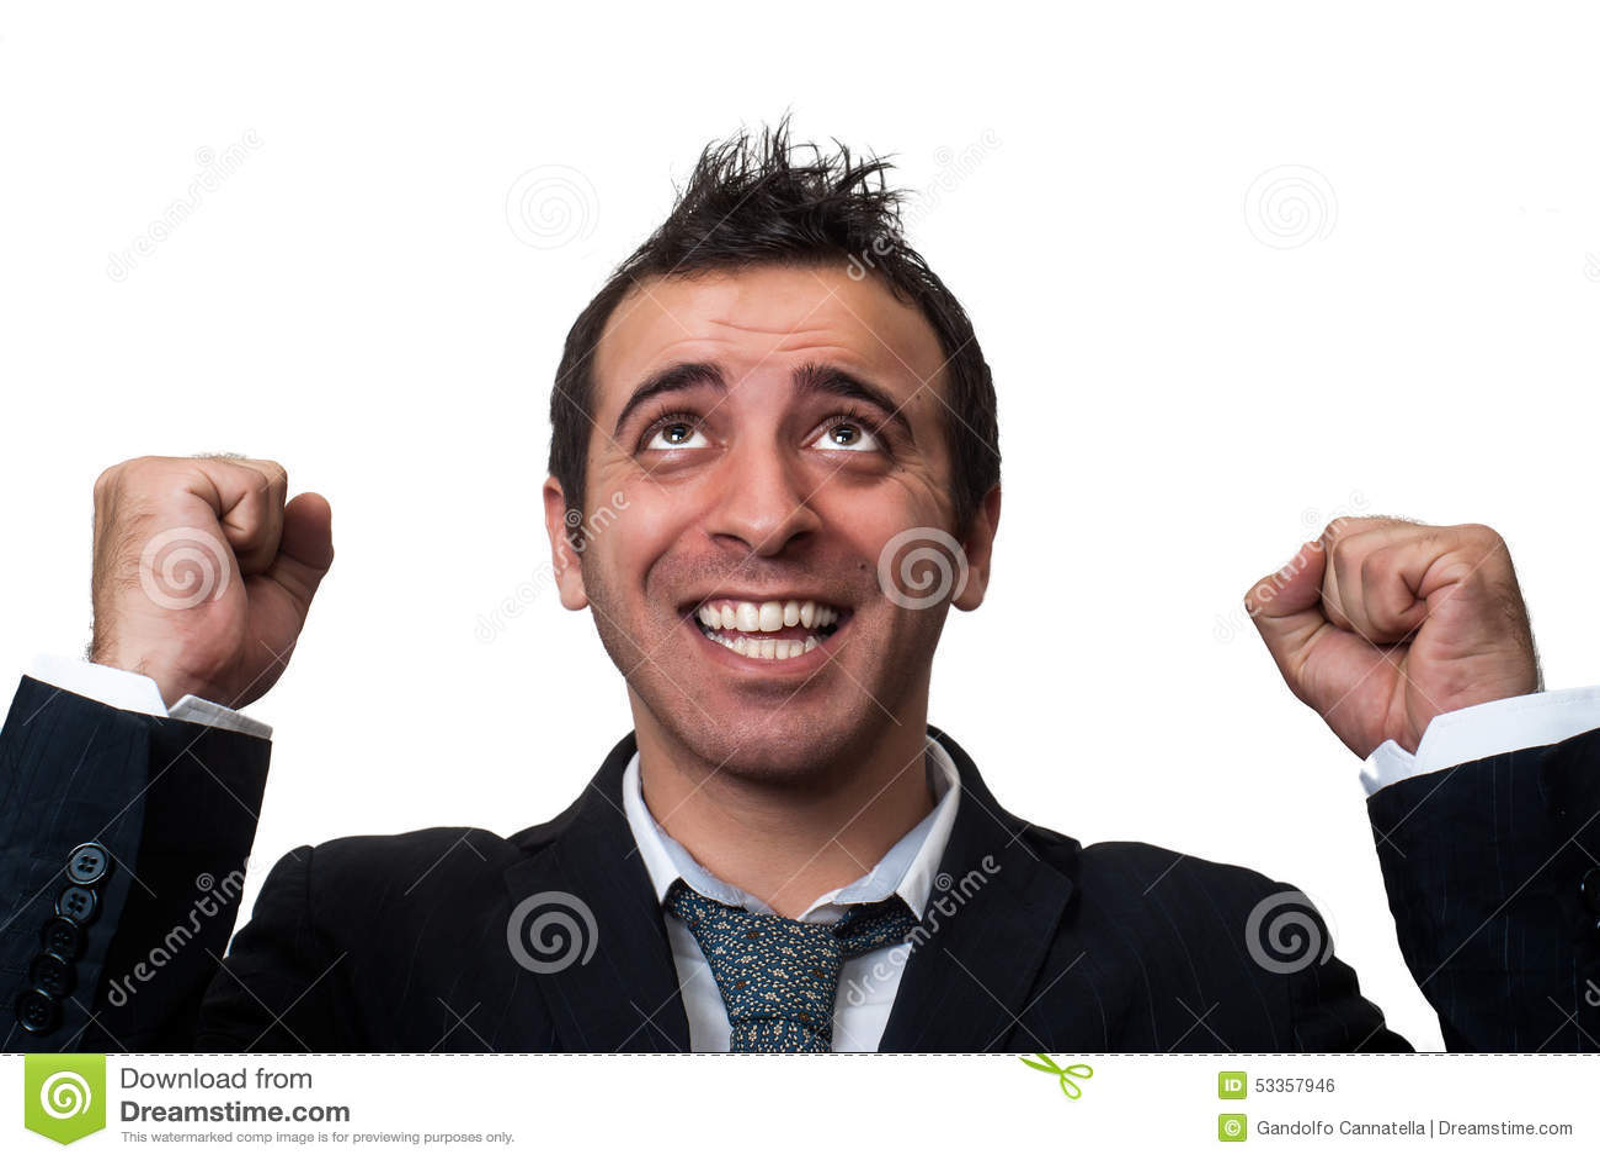 Businessman in dark suit fists raised looking up